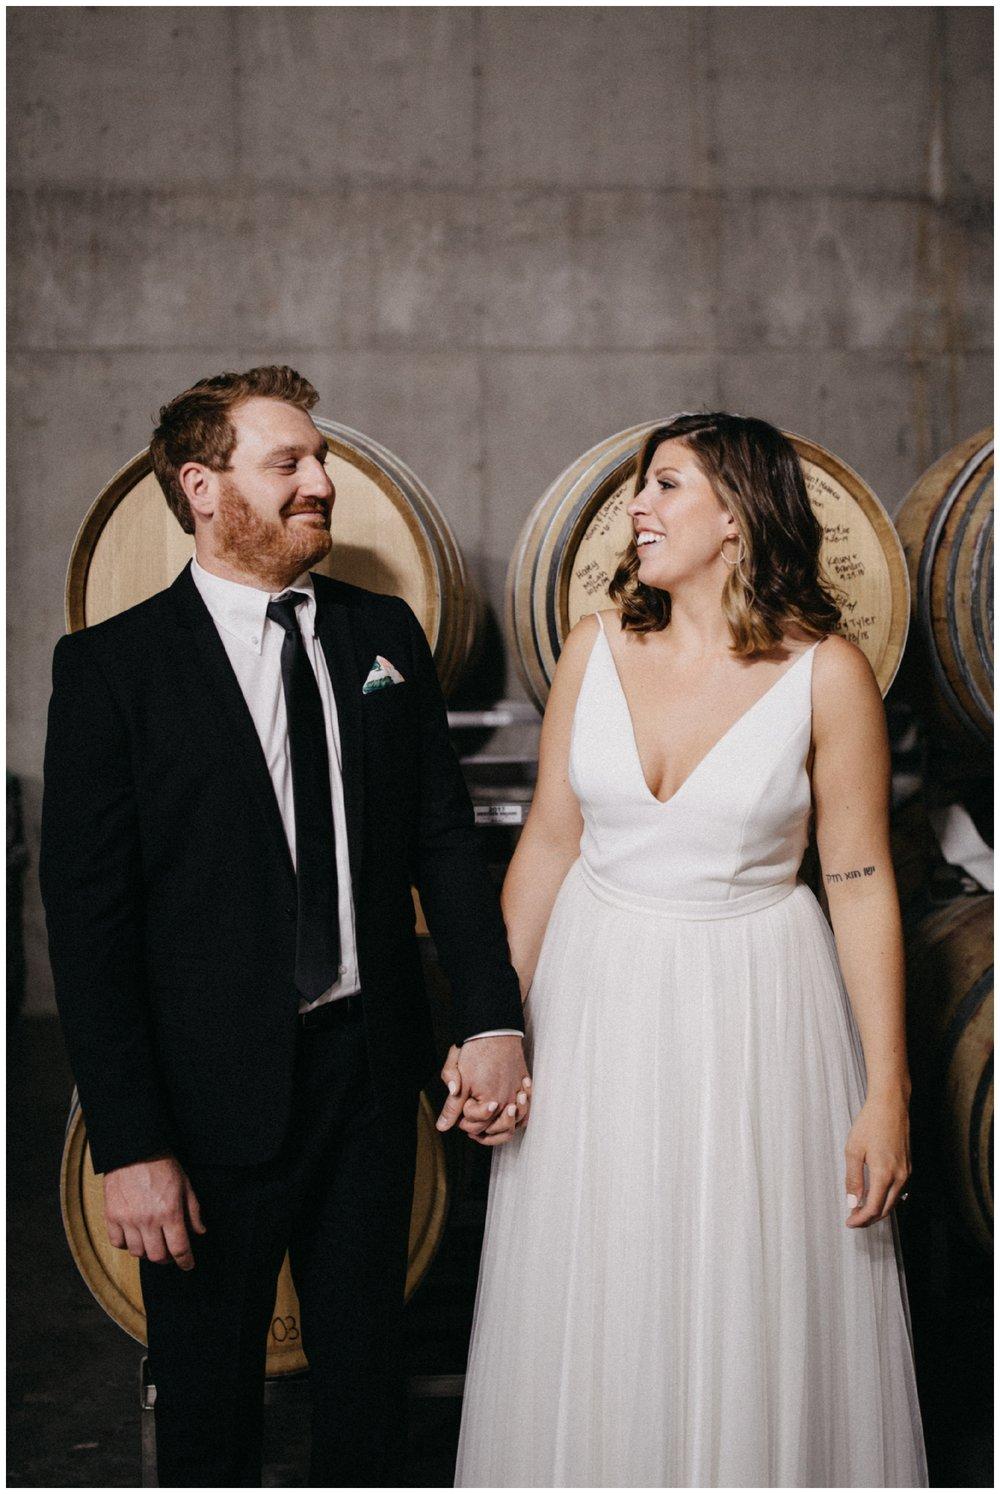 Winery wedding in Dellwood Minnesota